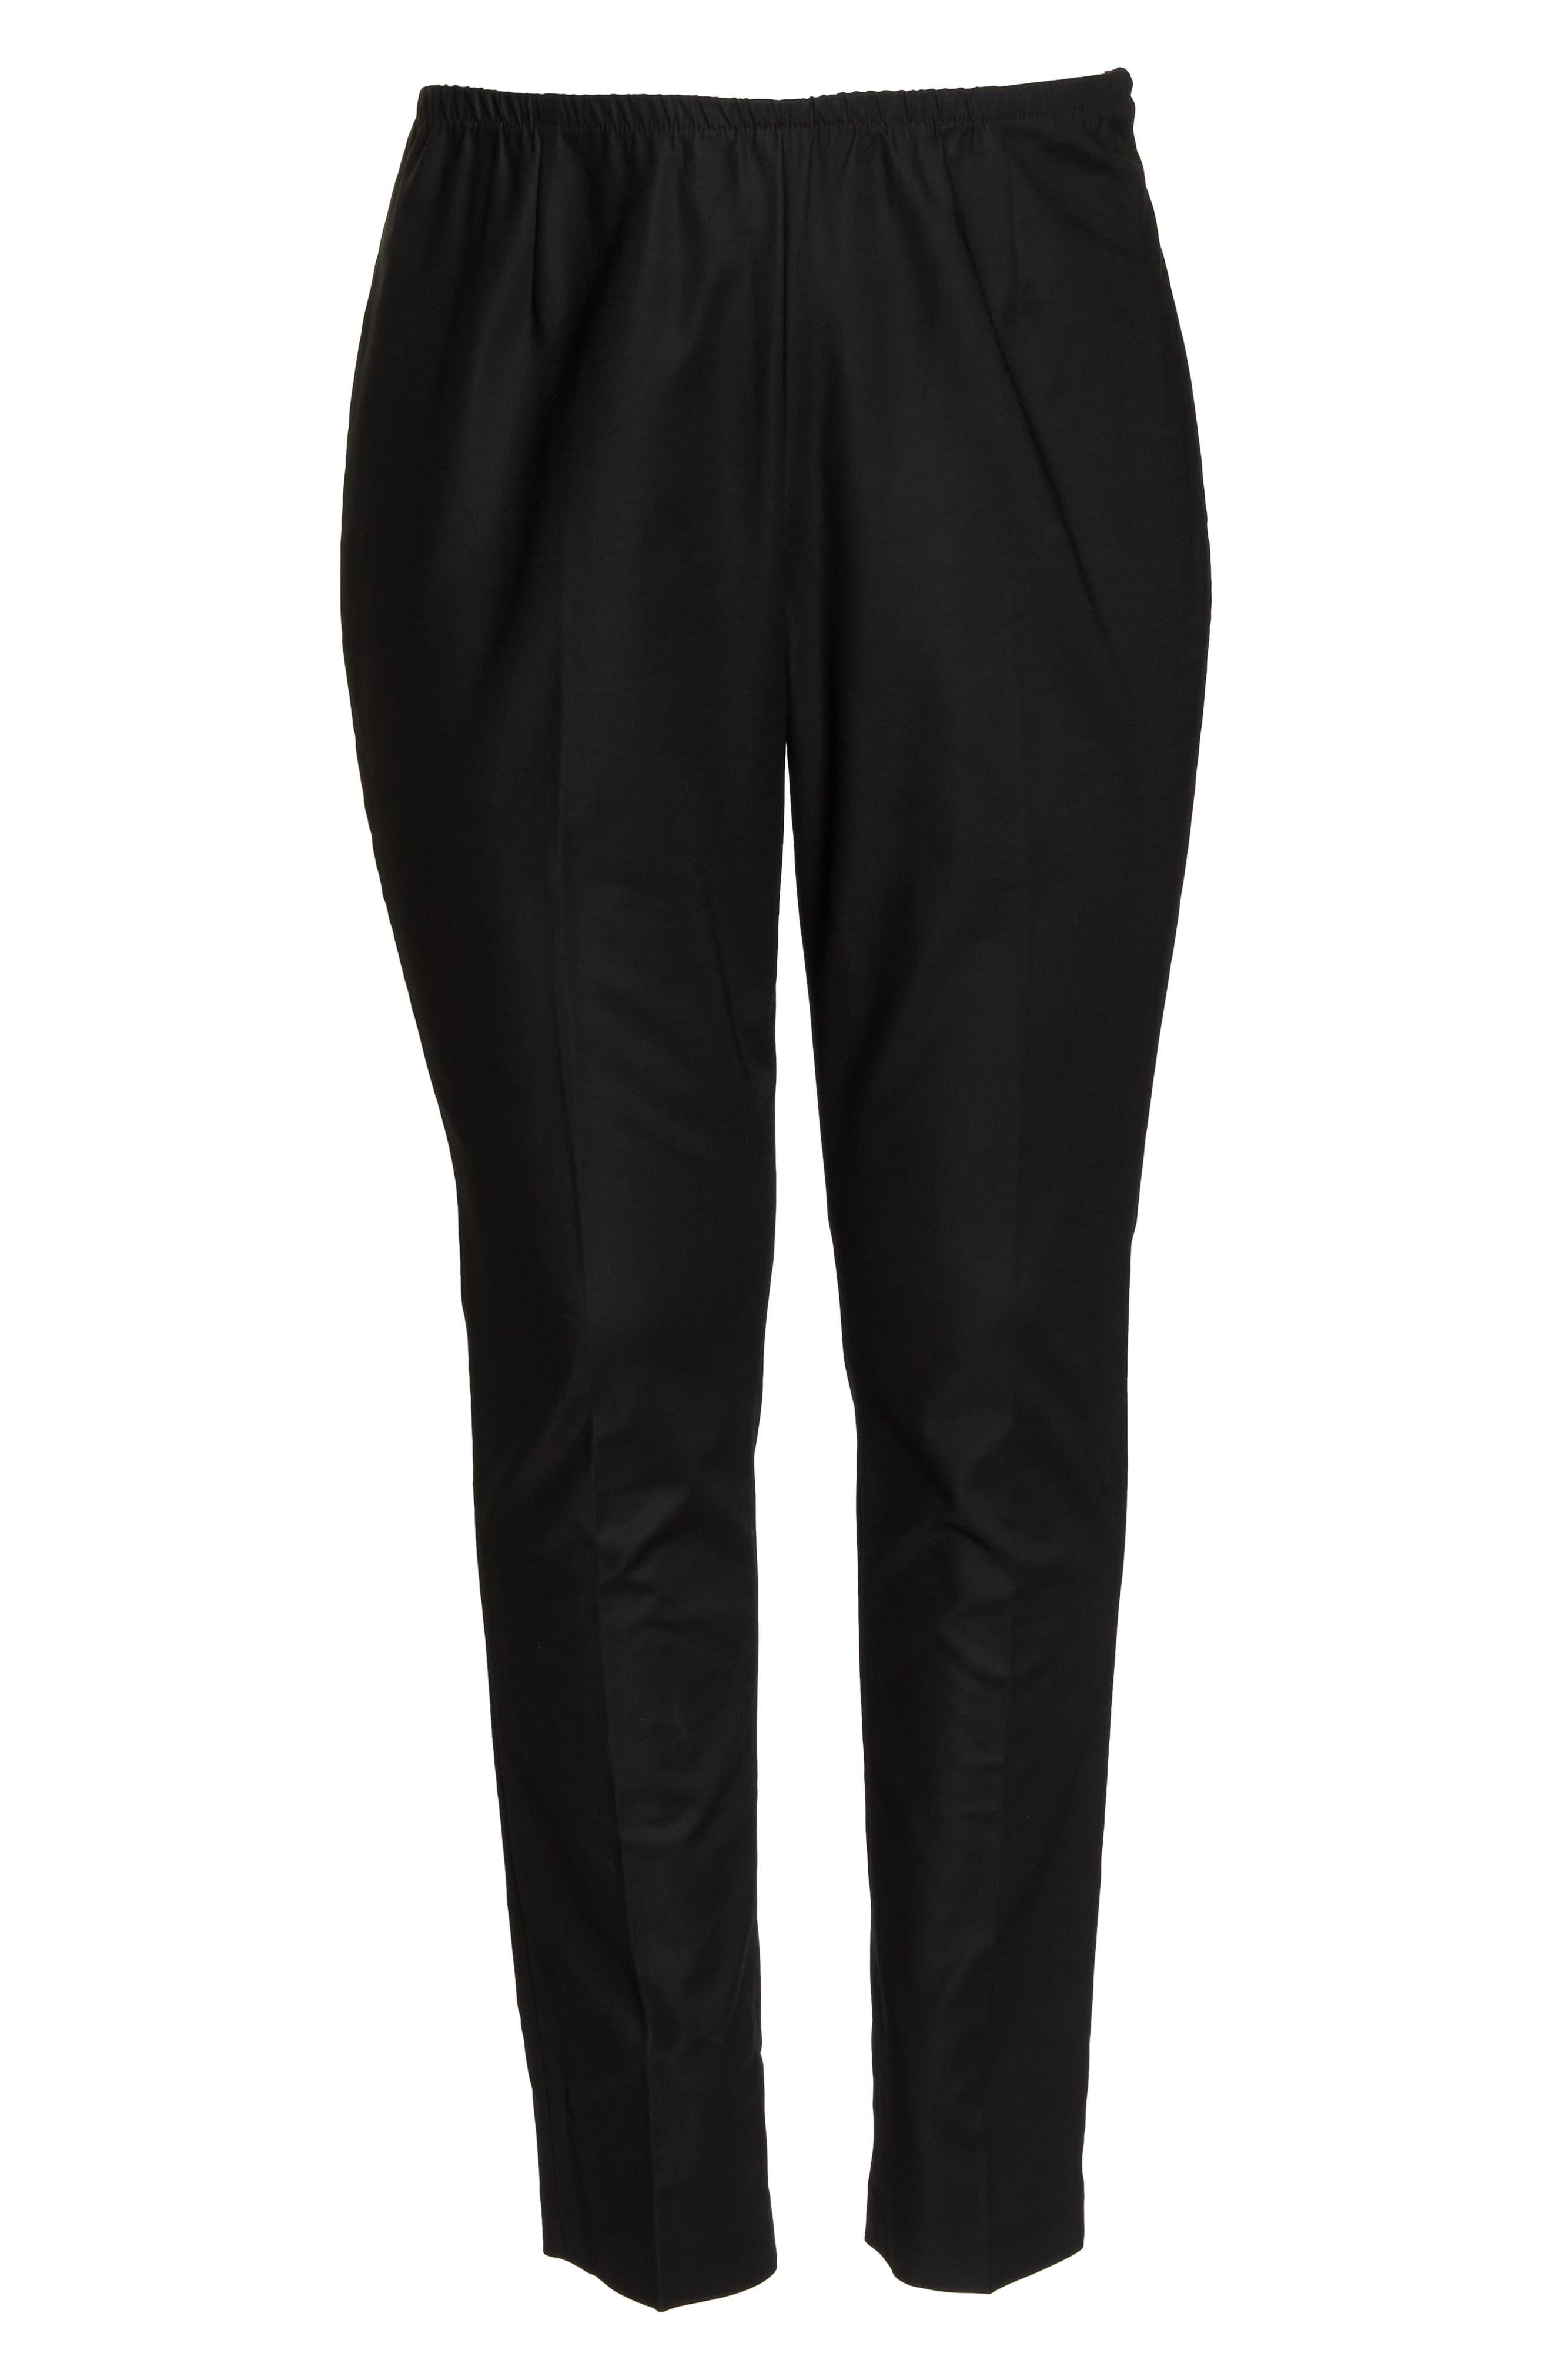 'Perfect' Side Zip Pants,                             Alternate thumbnail 6, color,                             BLACK ONYX